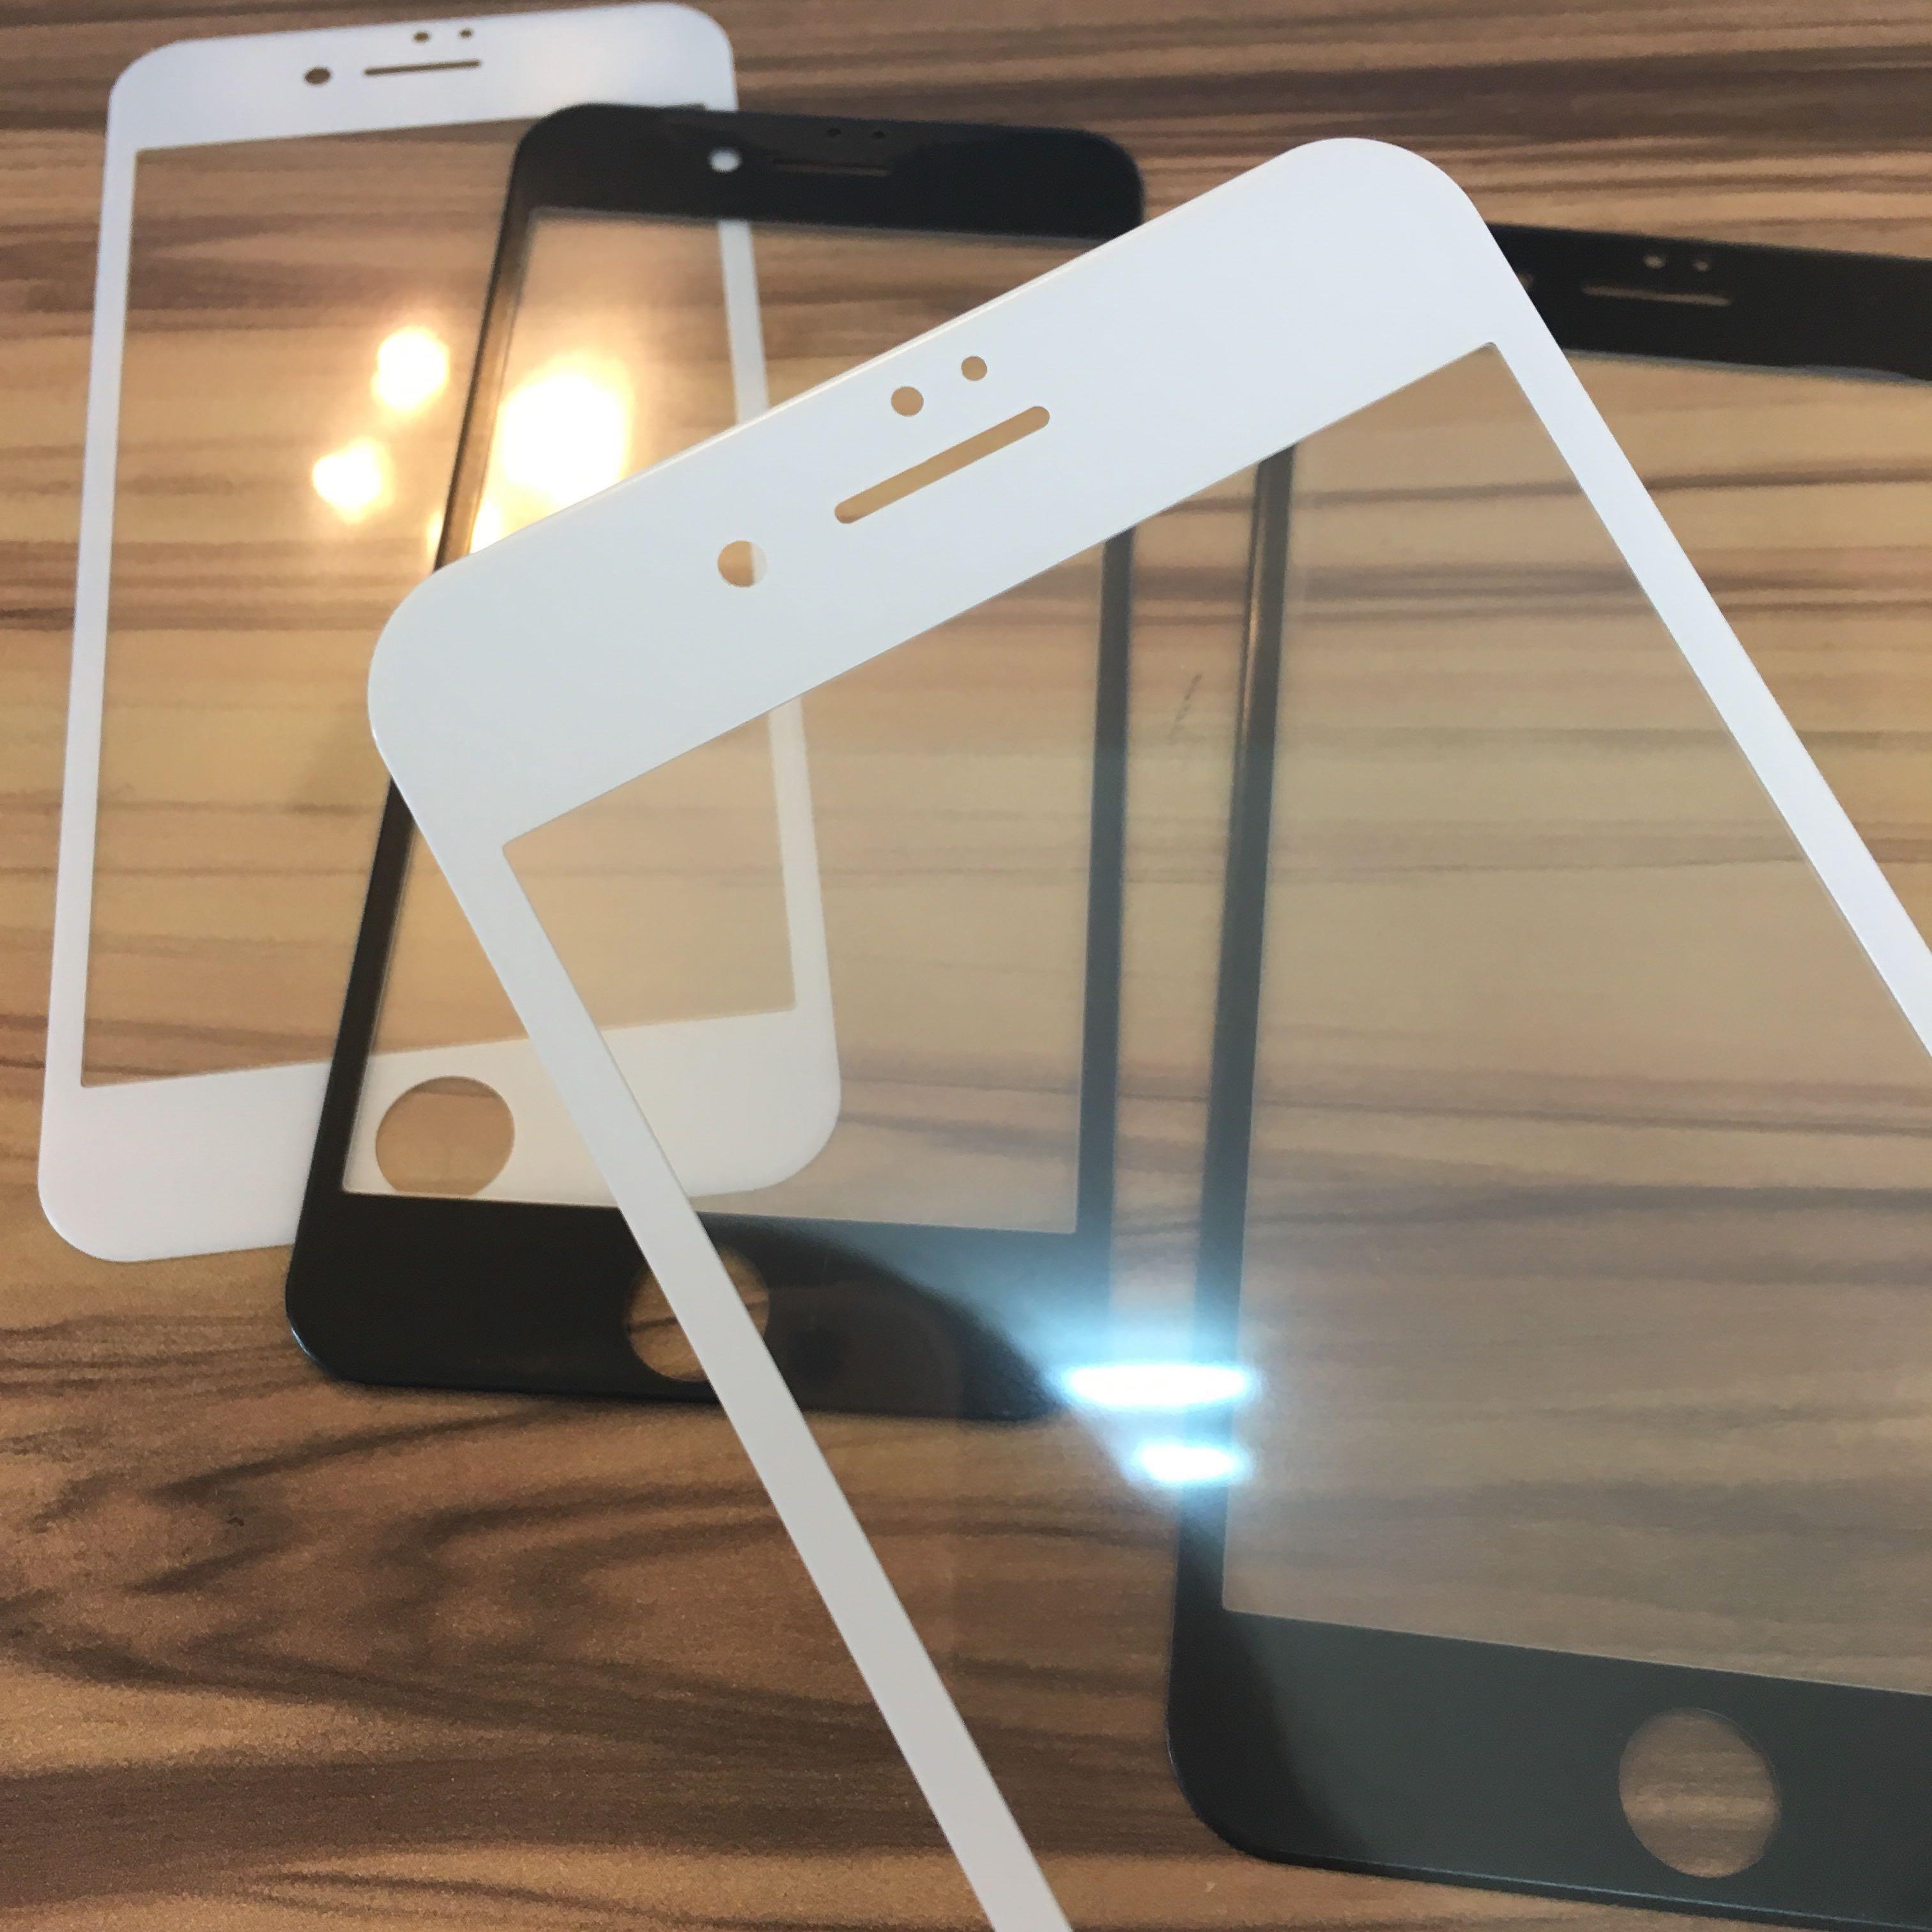 ip6 ip7 4.7 5.5 鋼化玻璃保護貼 滿版和非滿版